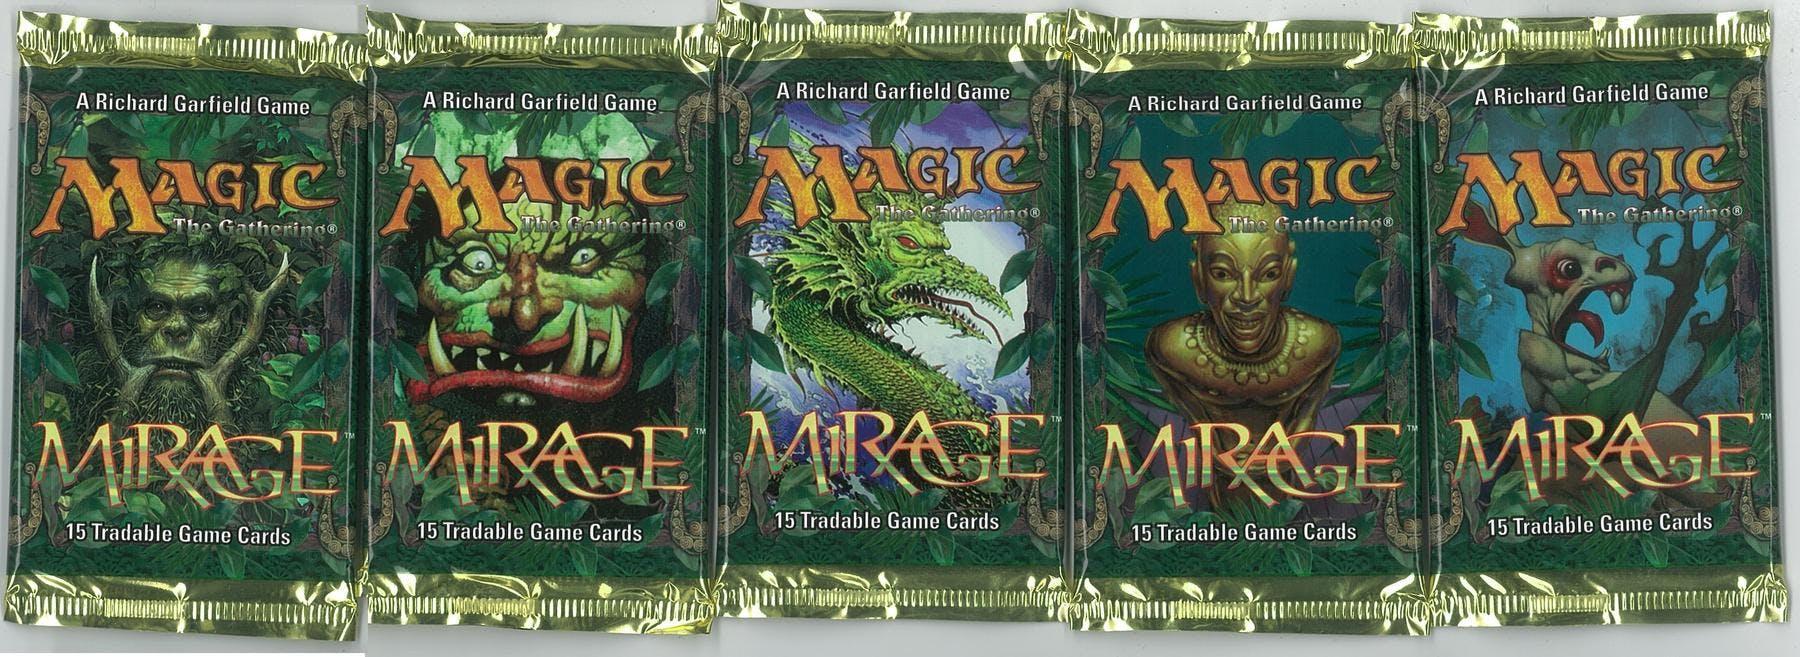 Magic the Gathering Mirage Booster Pack 5x LOT | DA Card World